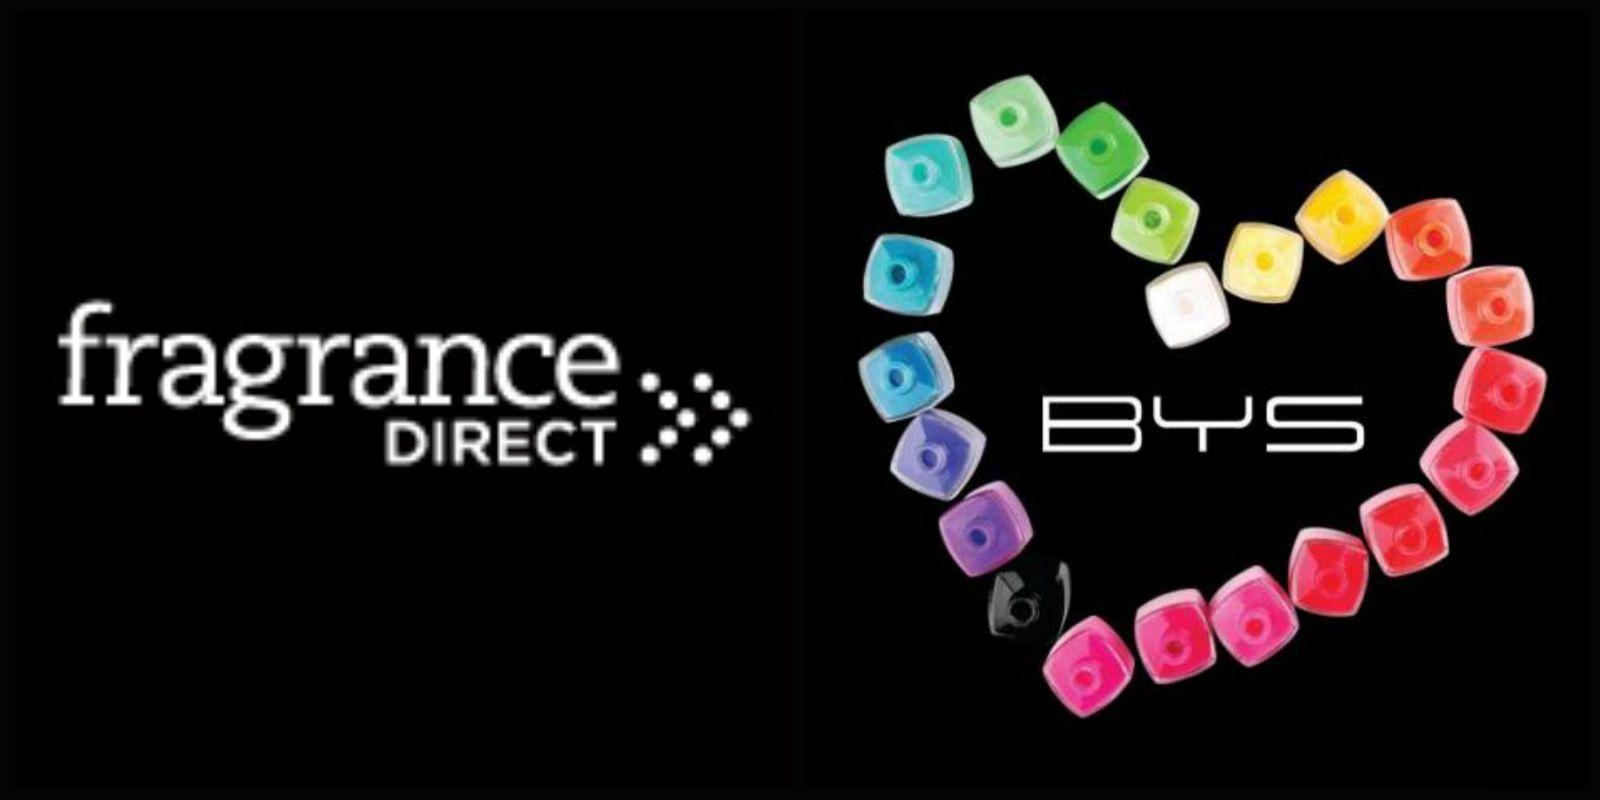 Perfume direct coupon code